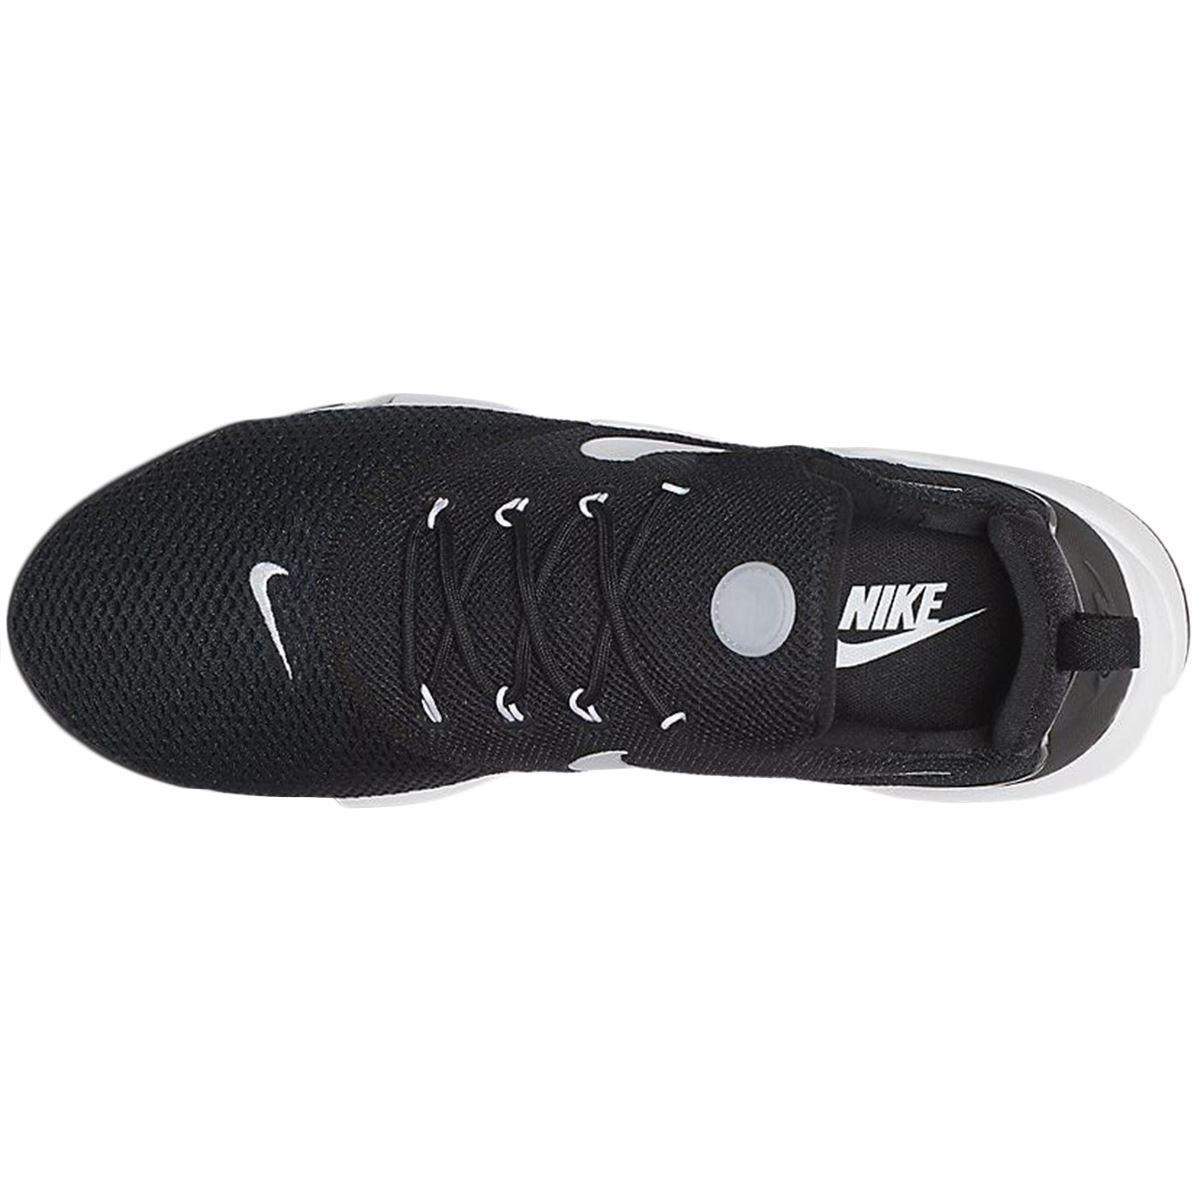 nike presto herren fliegen mesh spitzen eine top sneakers, schuhe herren presto - trainer läuft 8d9806